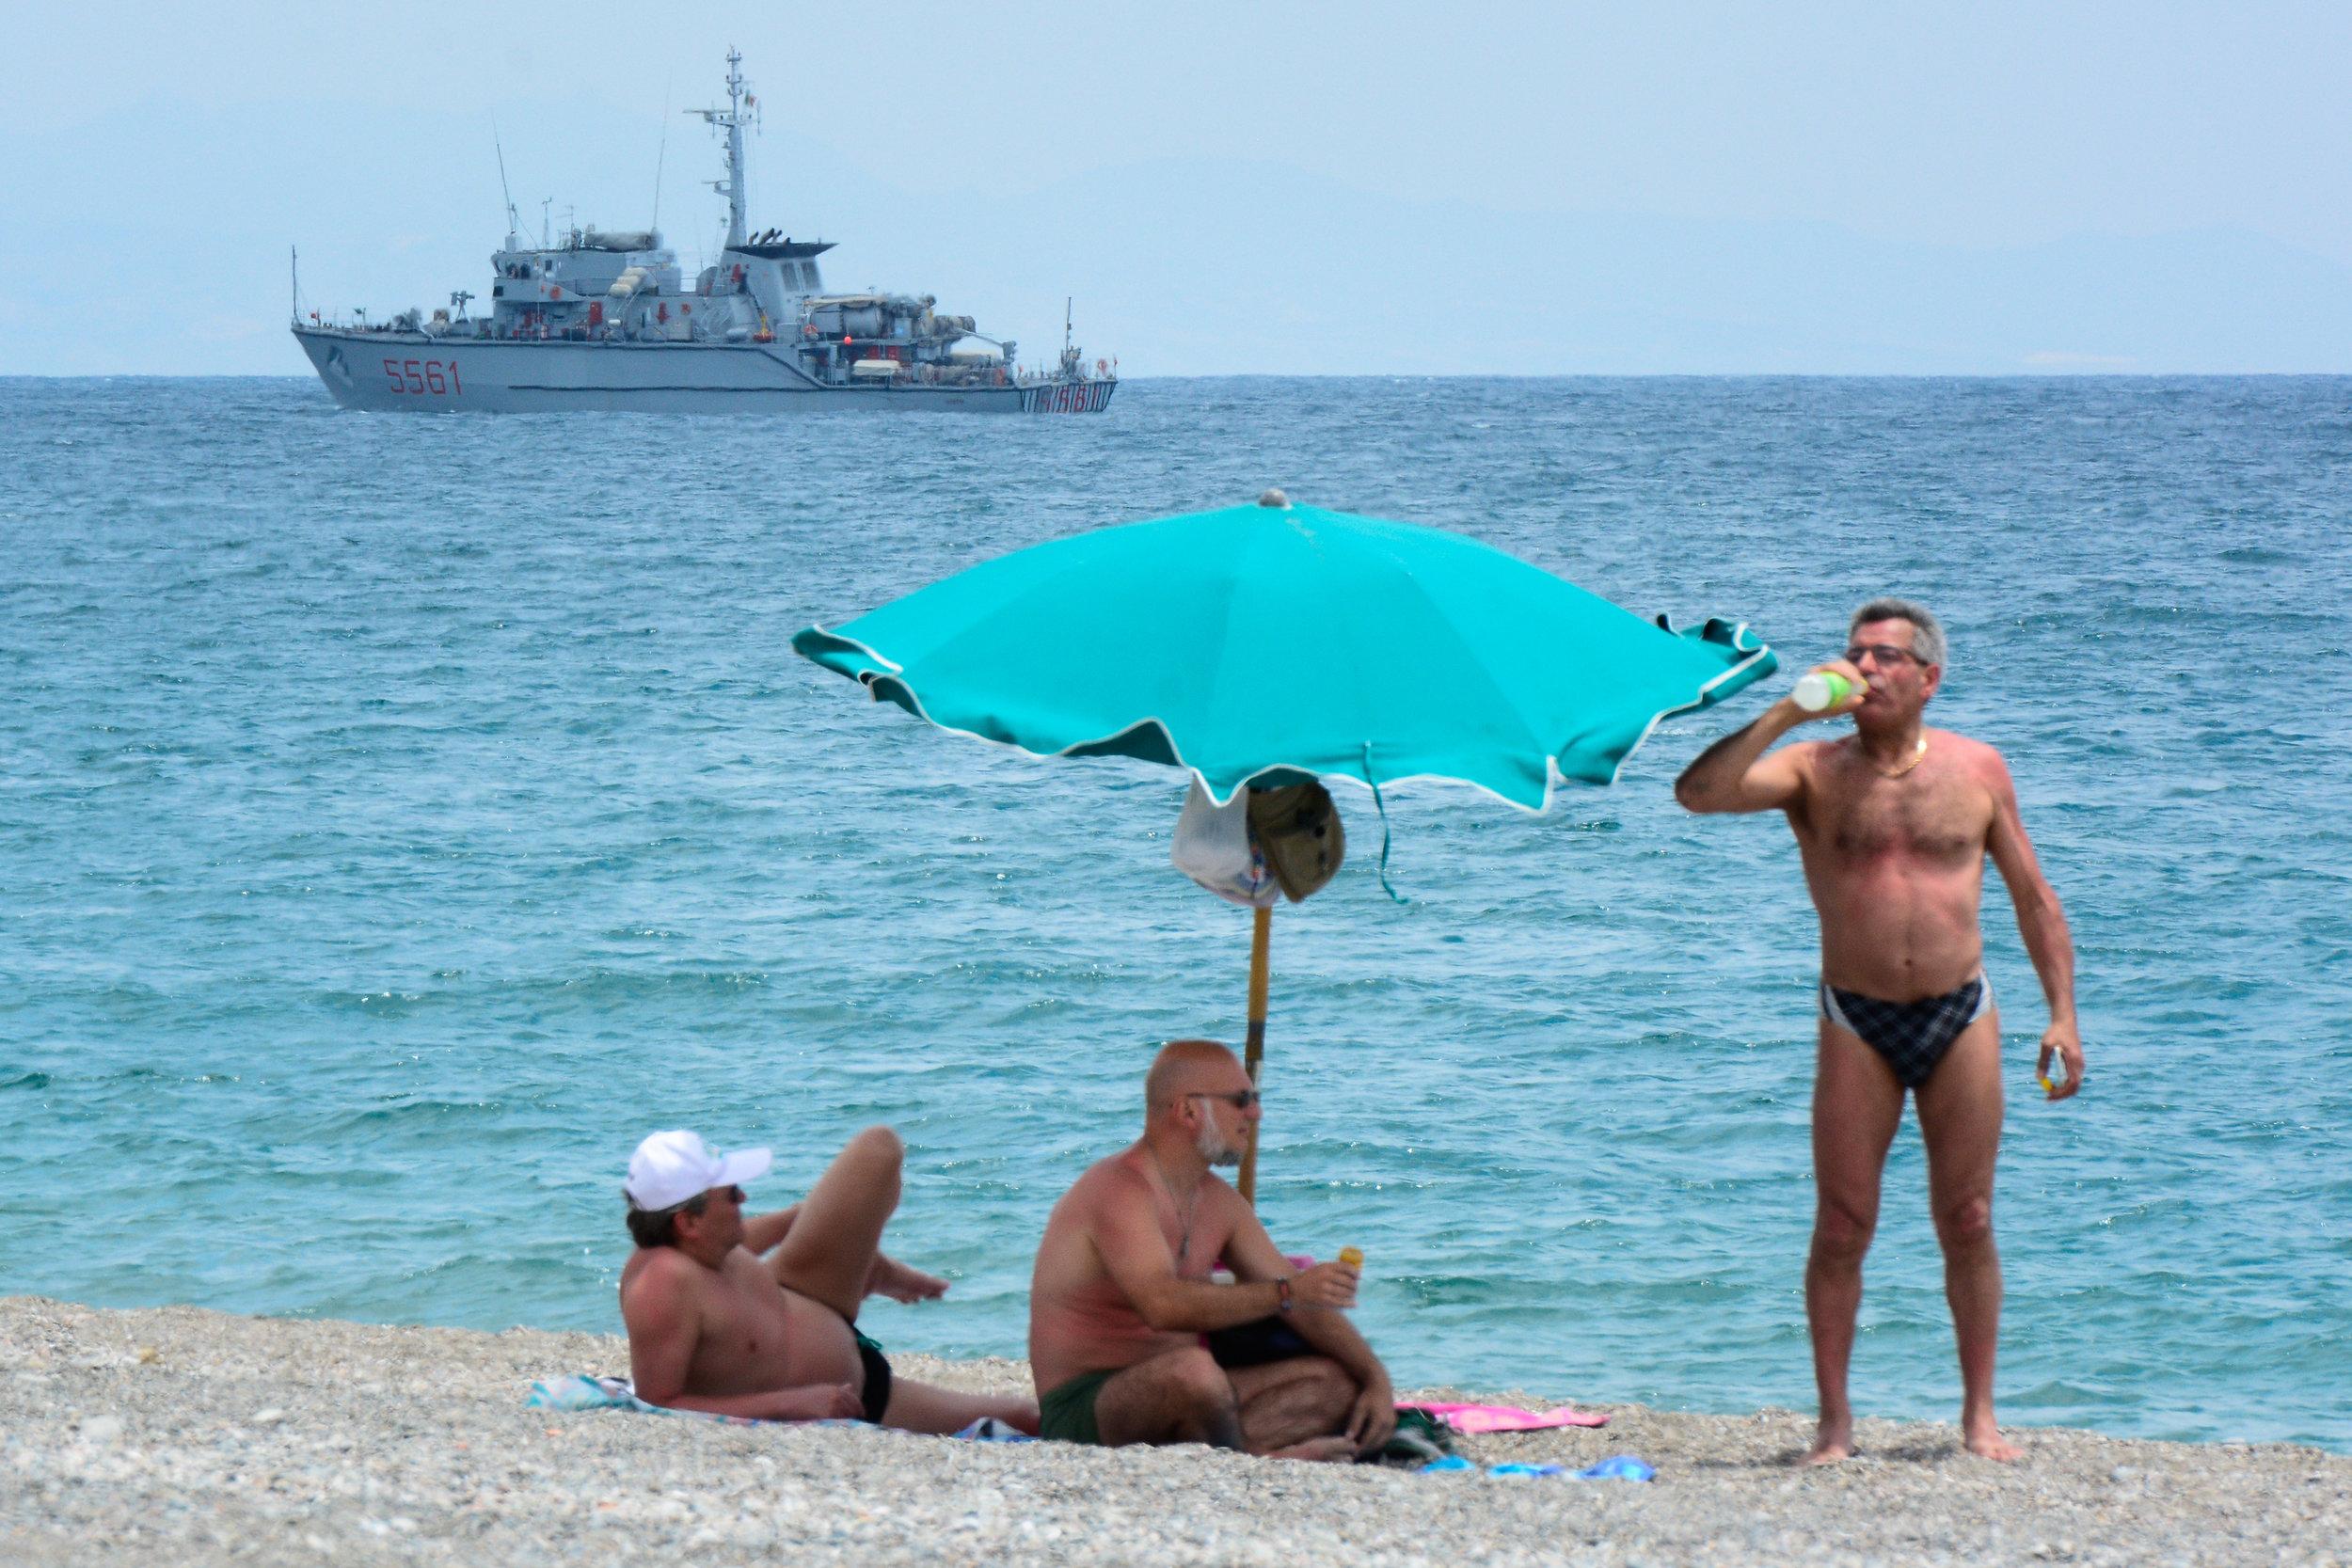 A Navy vessel patrols ahead the G7 summit in Giardini Naxos, Sicily, Italy, May 25, 2017.